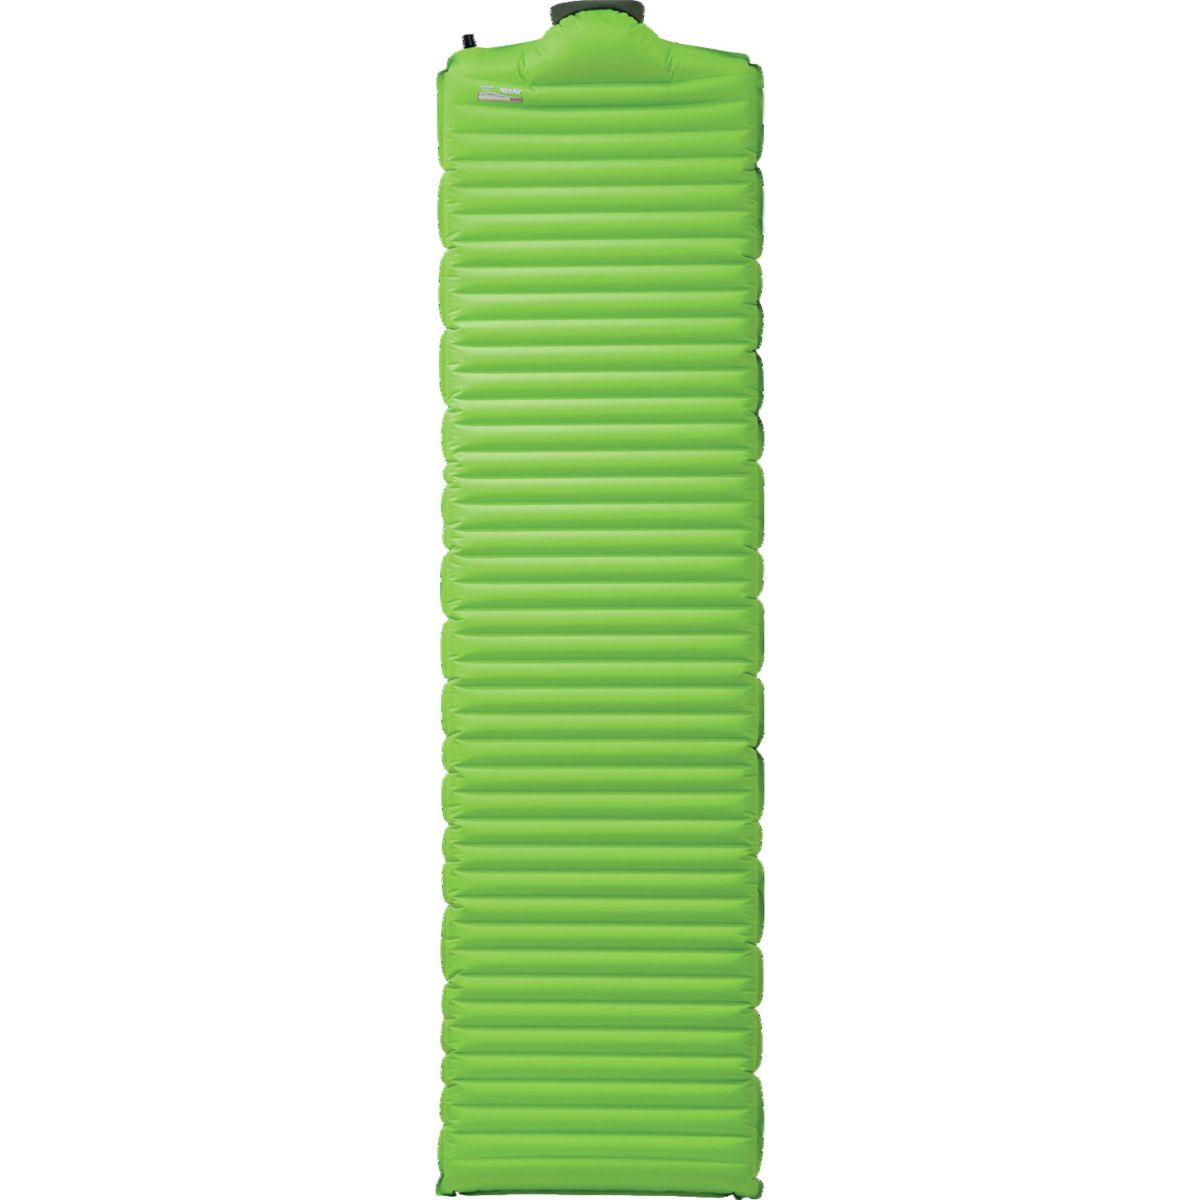 Therm-a-Rest NeoAir All Season SV Sleeping Pad Gecko, Regular